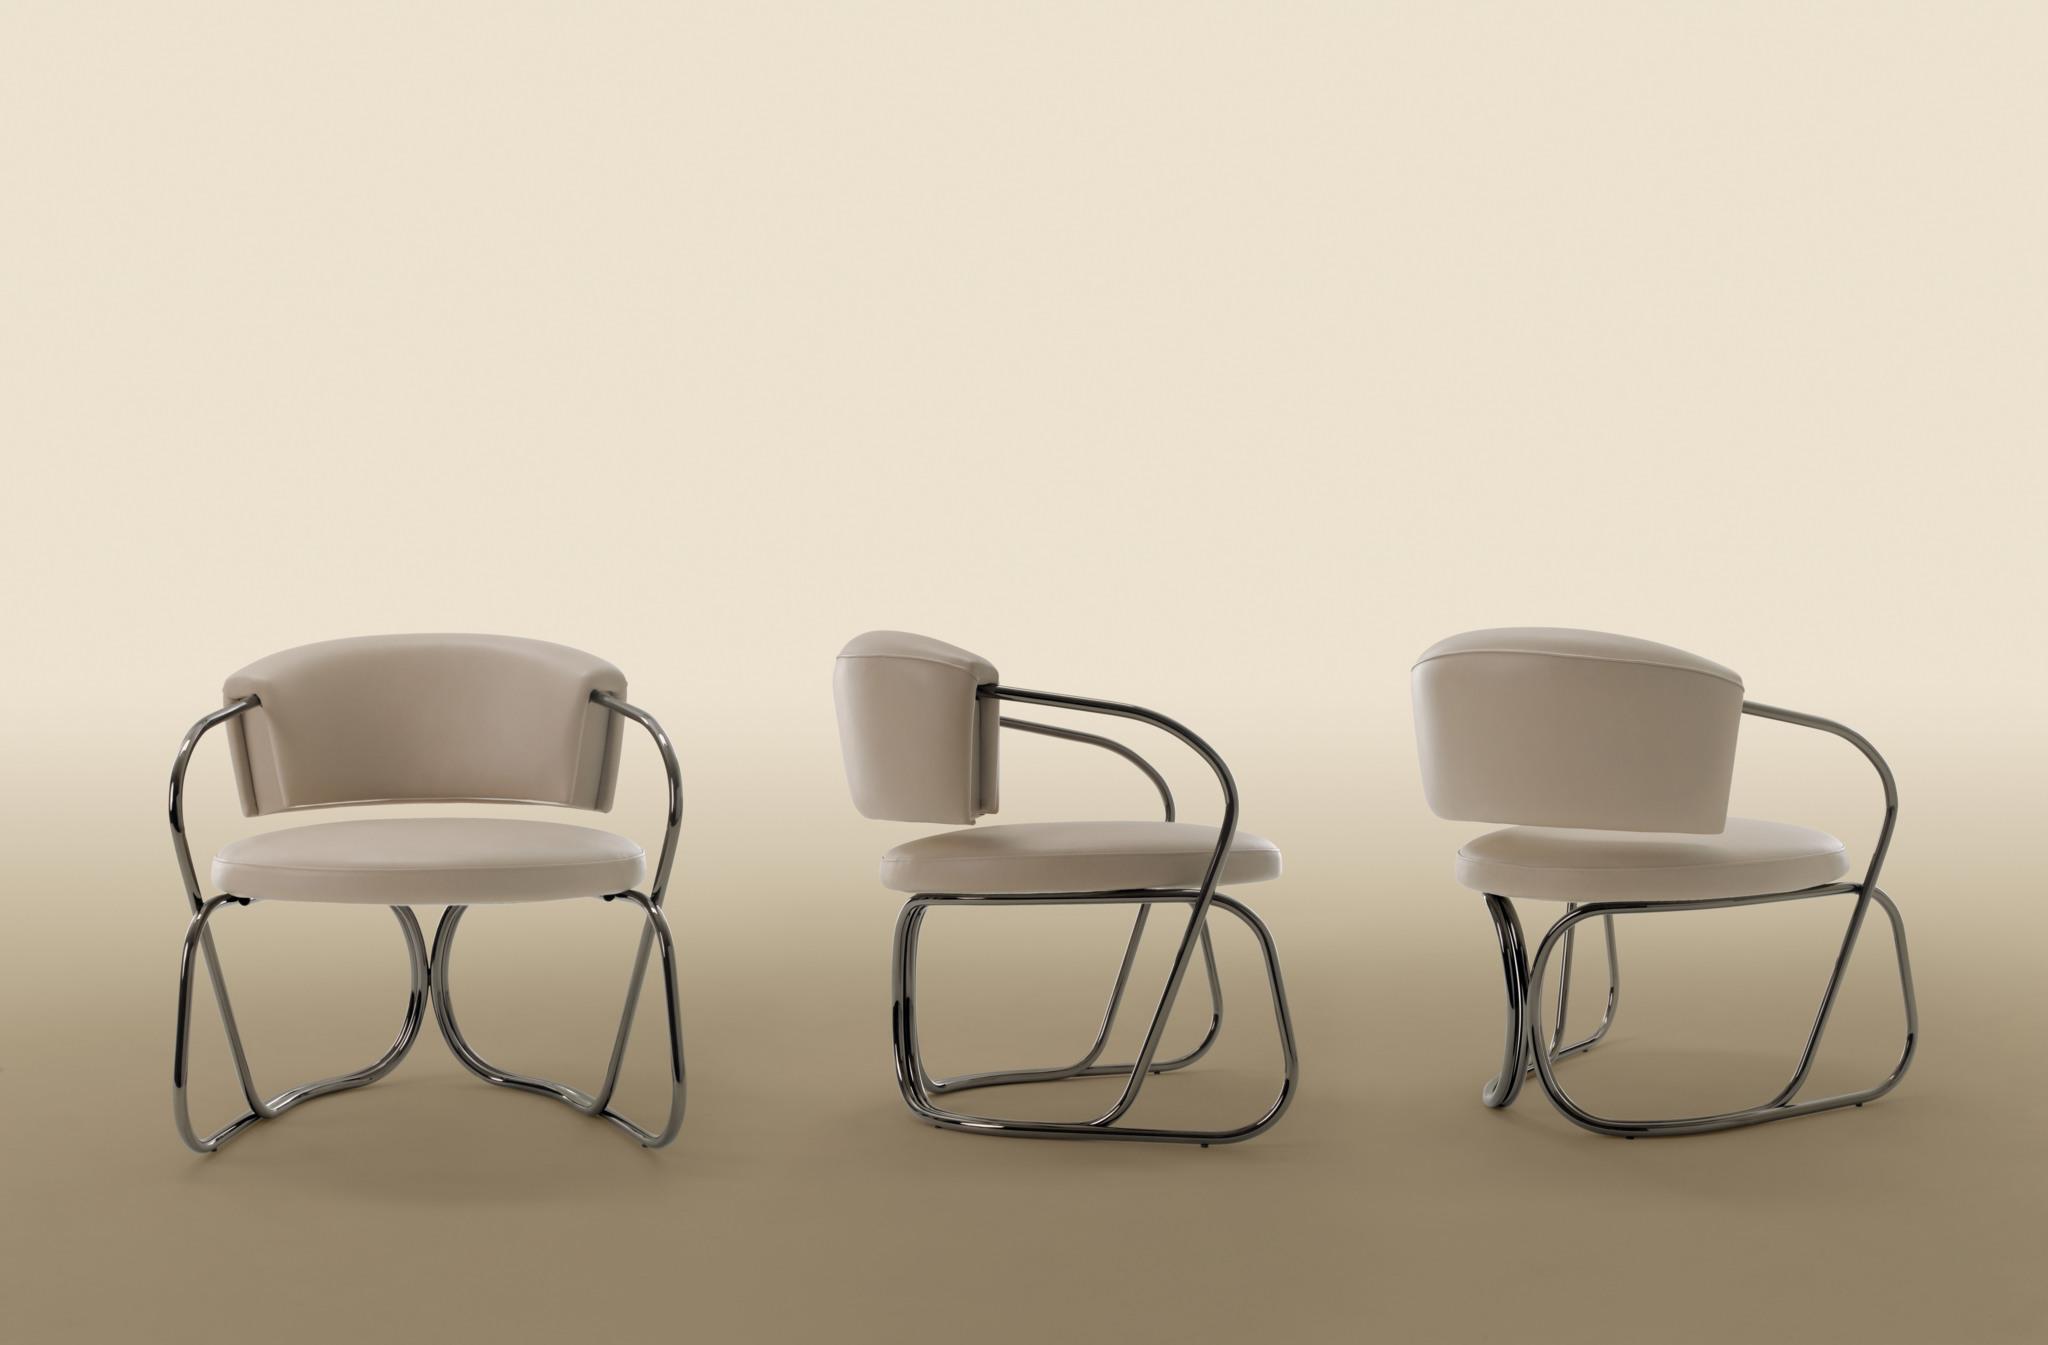 Trus00040000005_trussardi_round_armchair_detail_8_a62ac02f54ac0bb441d75b88653c8813